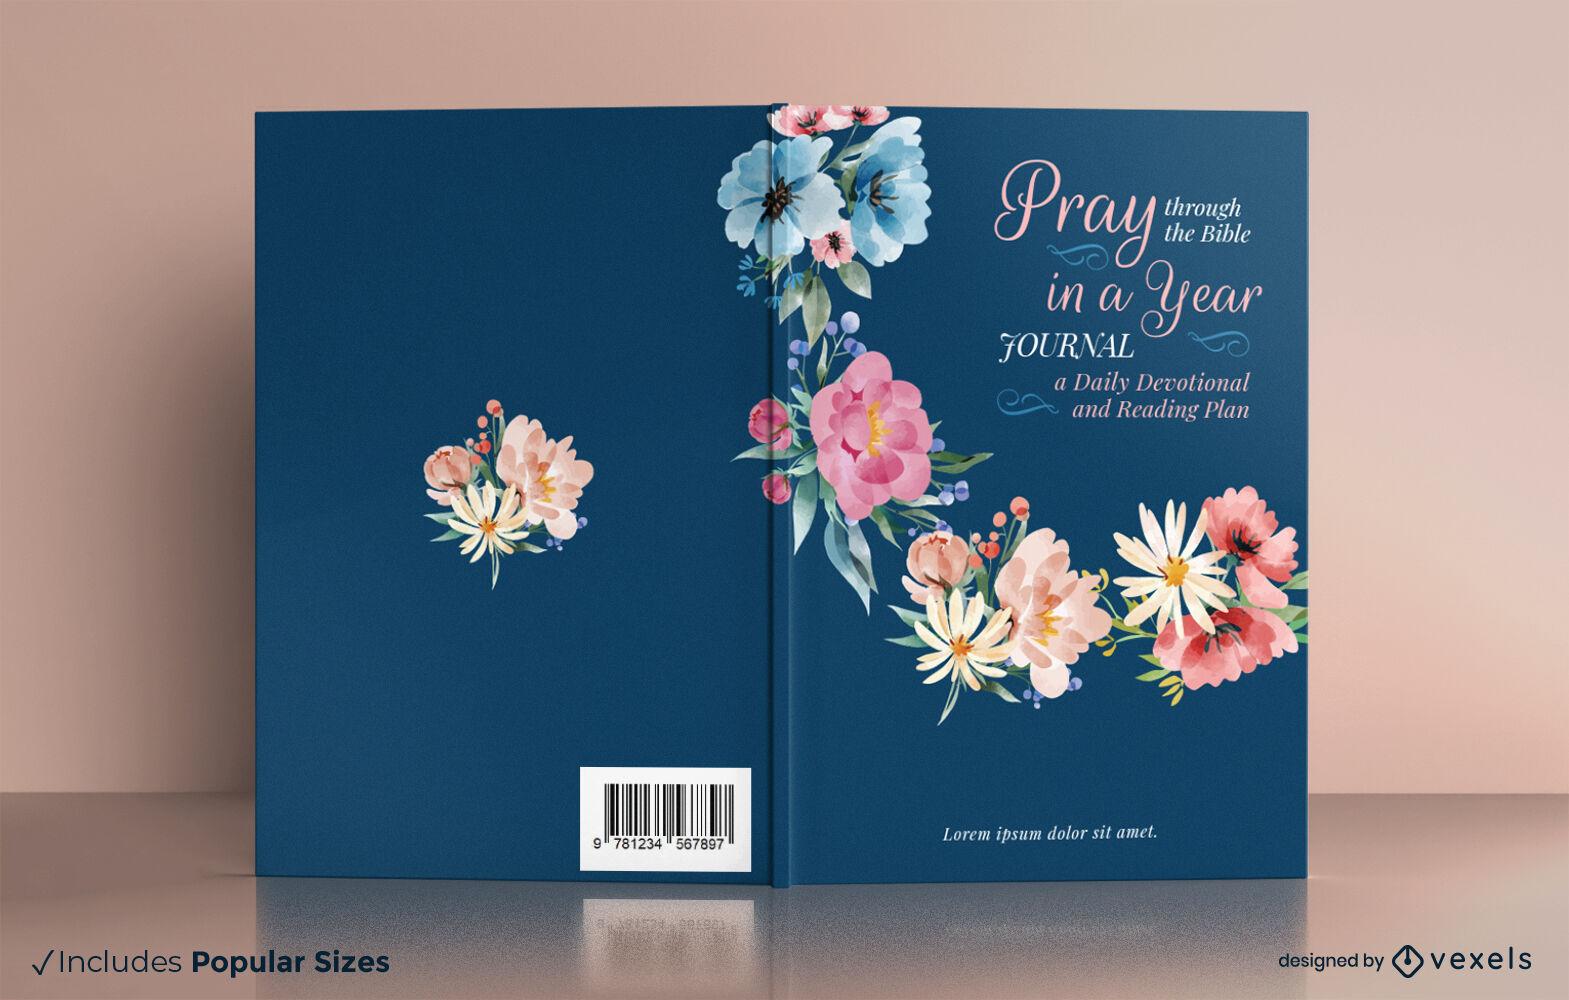 Floral prayer journal watercolor book cover design